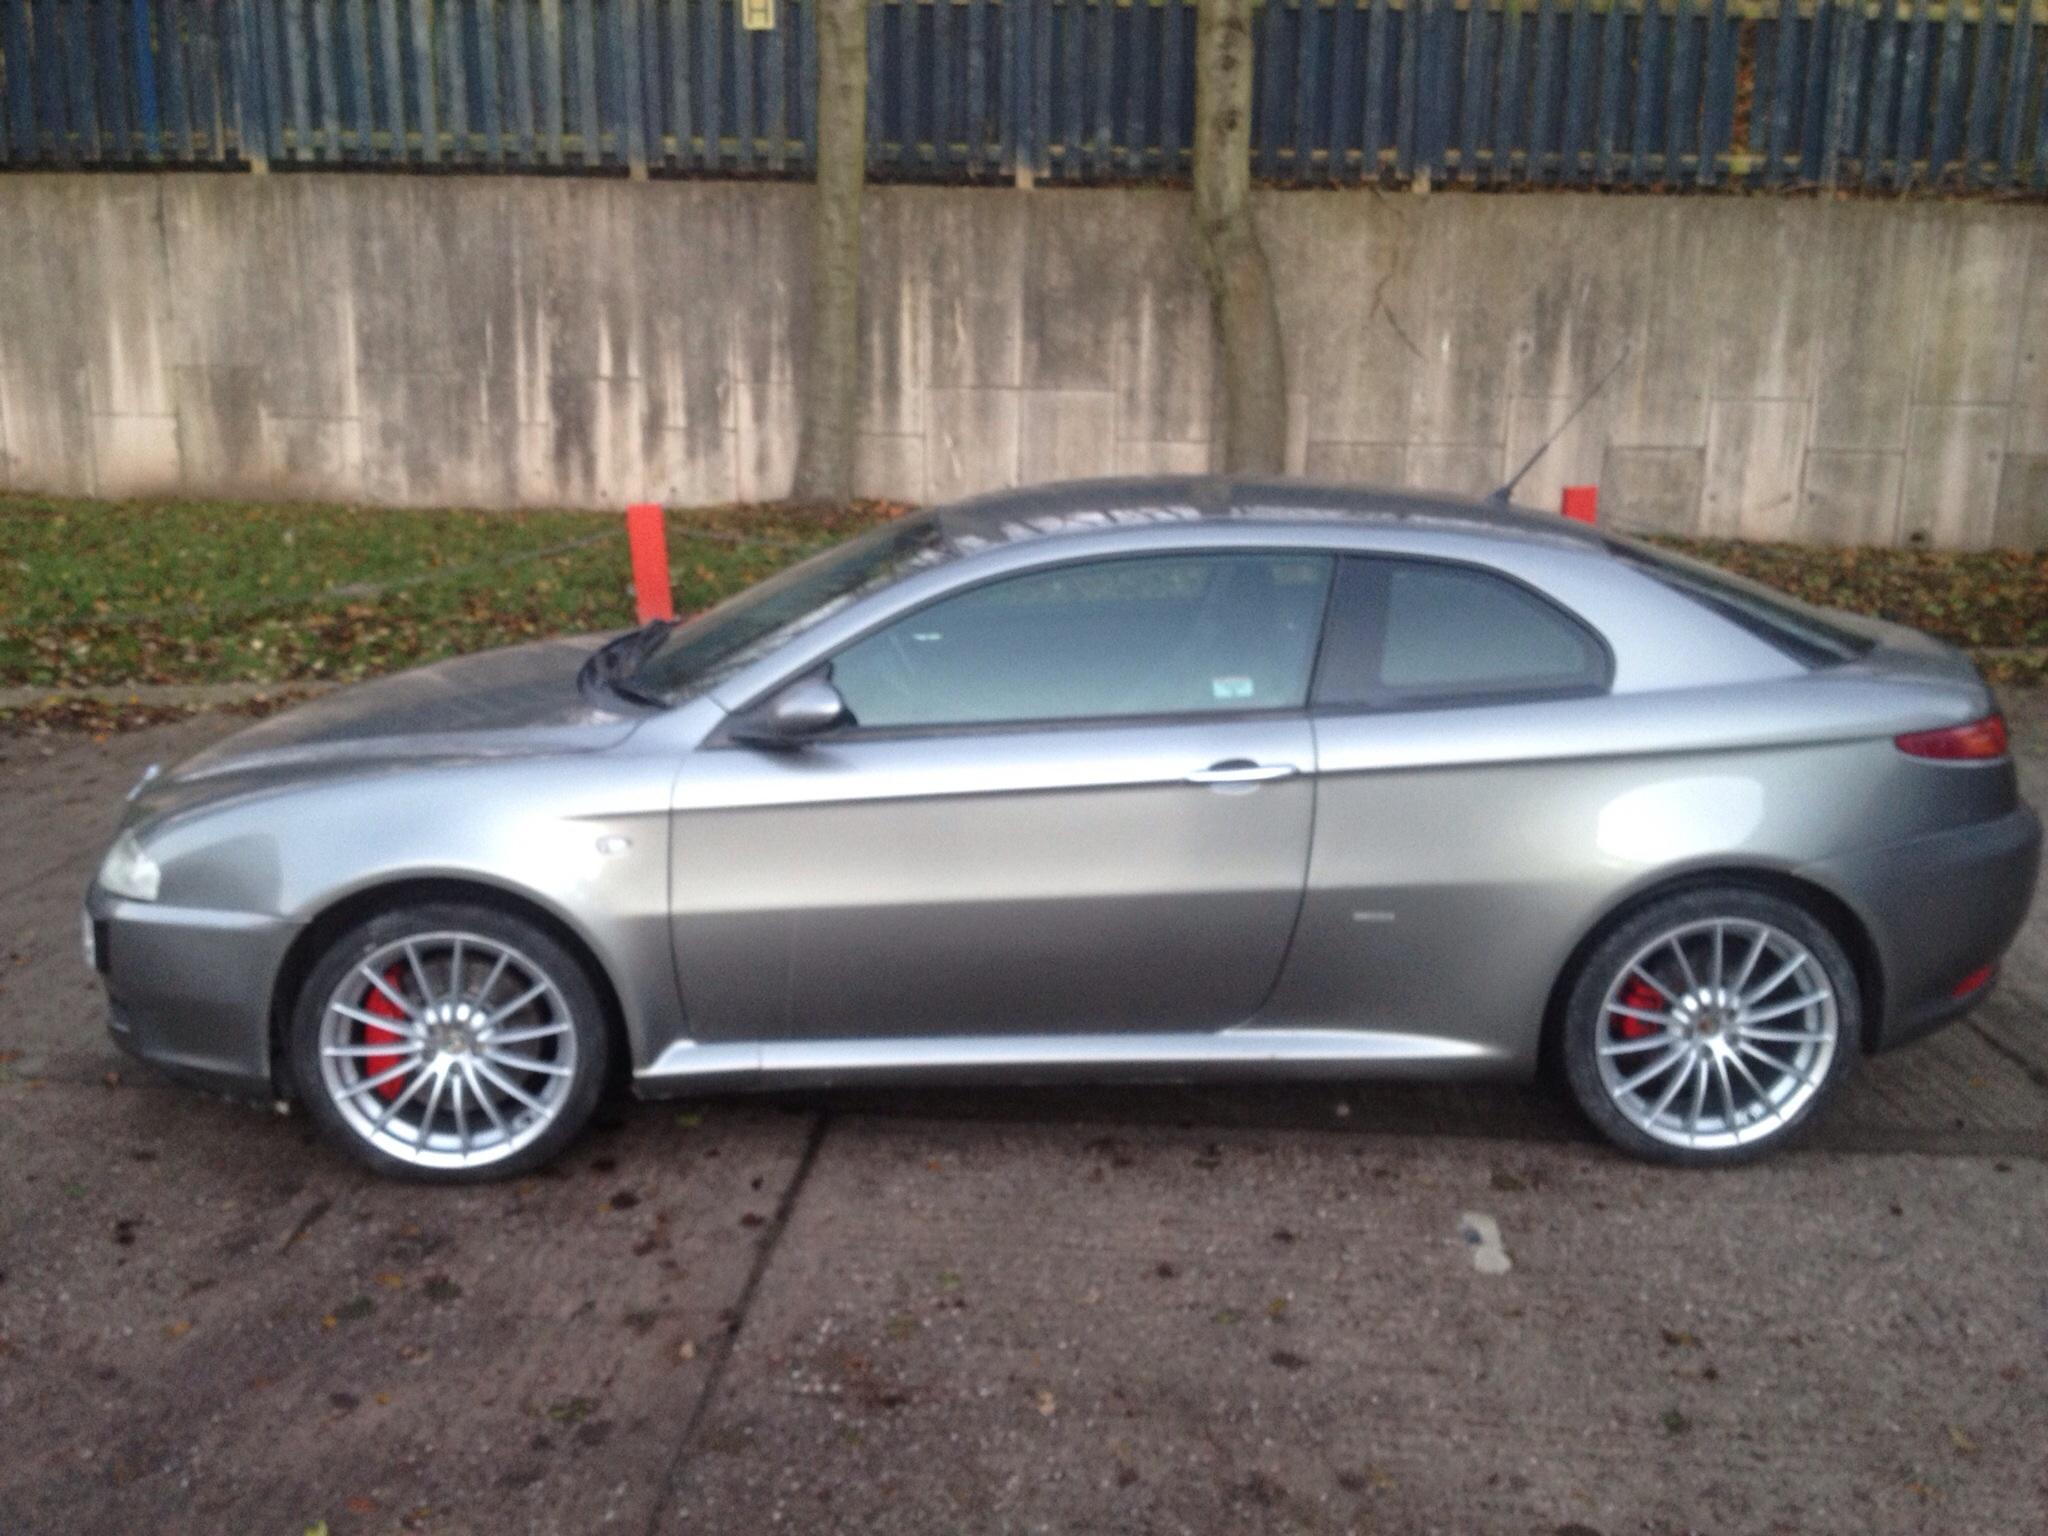 Alfa romeo gt 3 2 v6 breaking for spares italia auto parts - Alfa Romeo Gt 3 2 V6 Breaking For Spares Italia Auto Parts